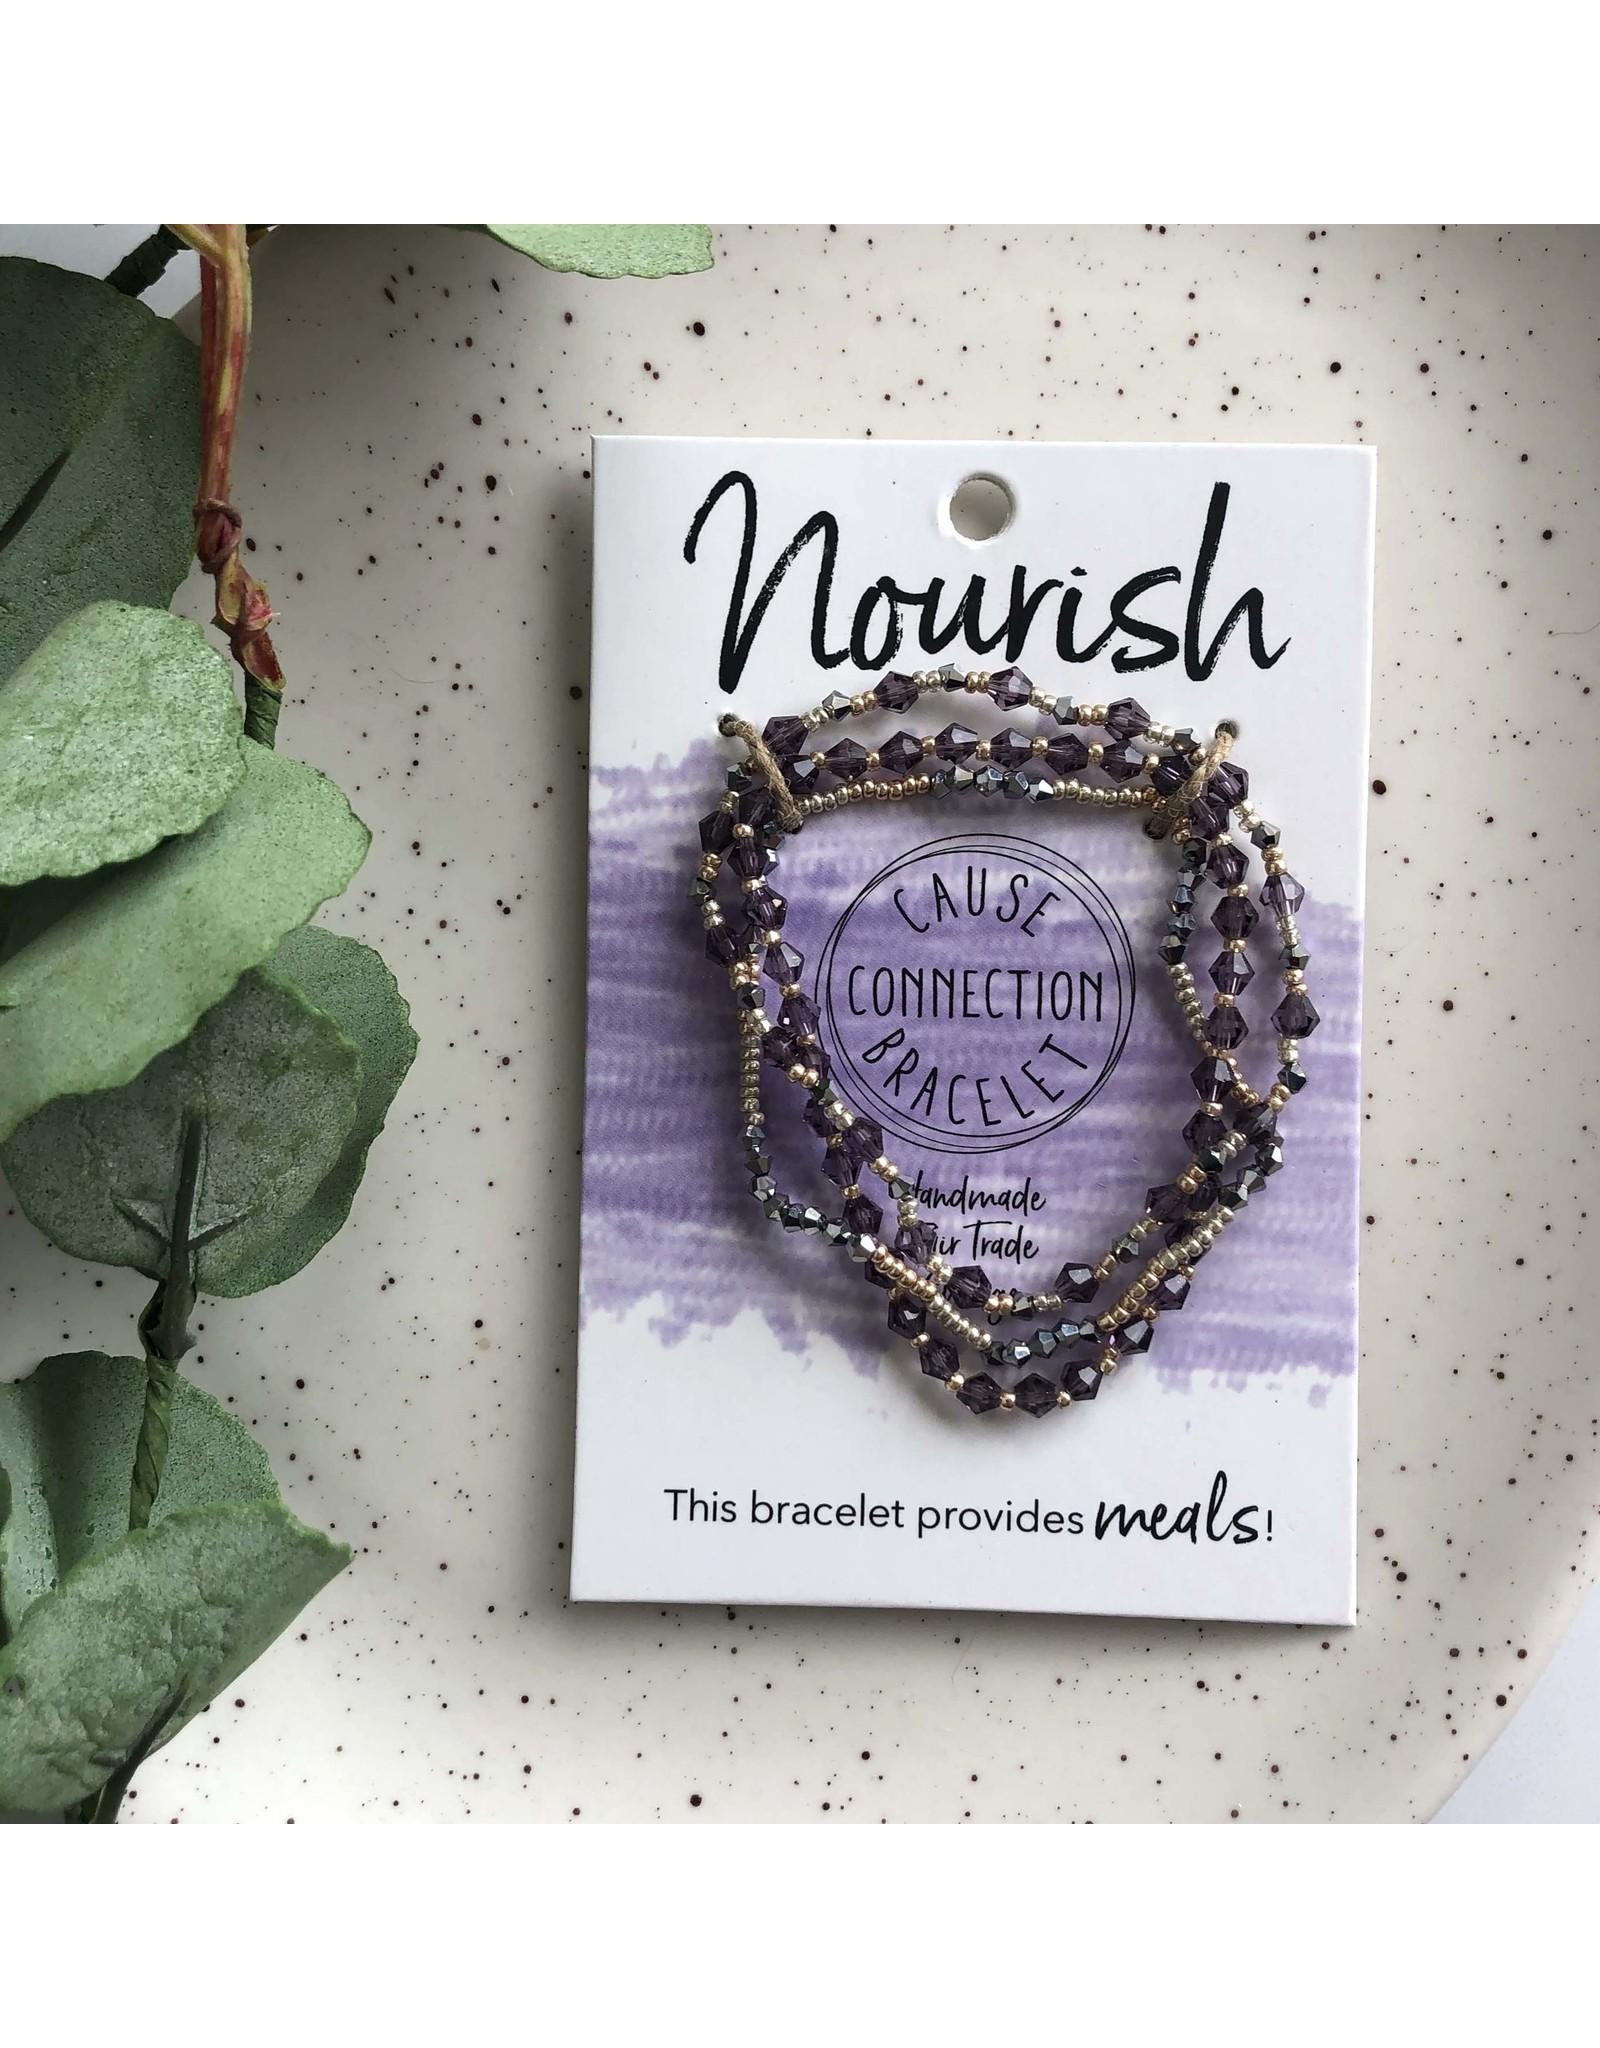 Cause Connection Bracelet, Nourish, India